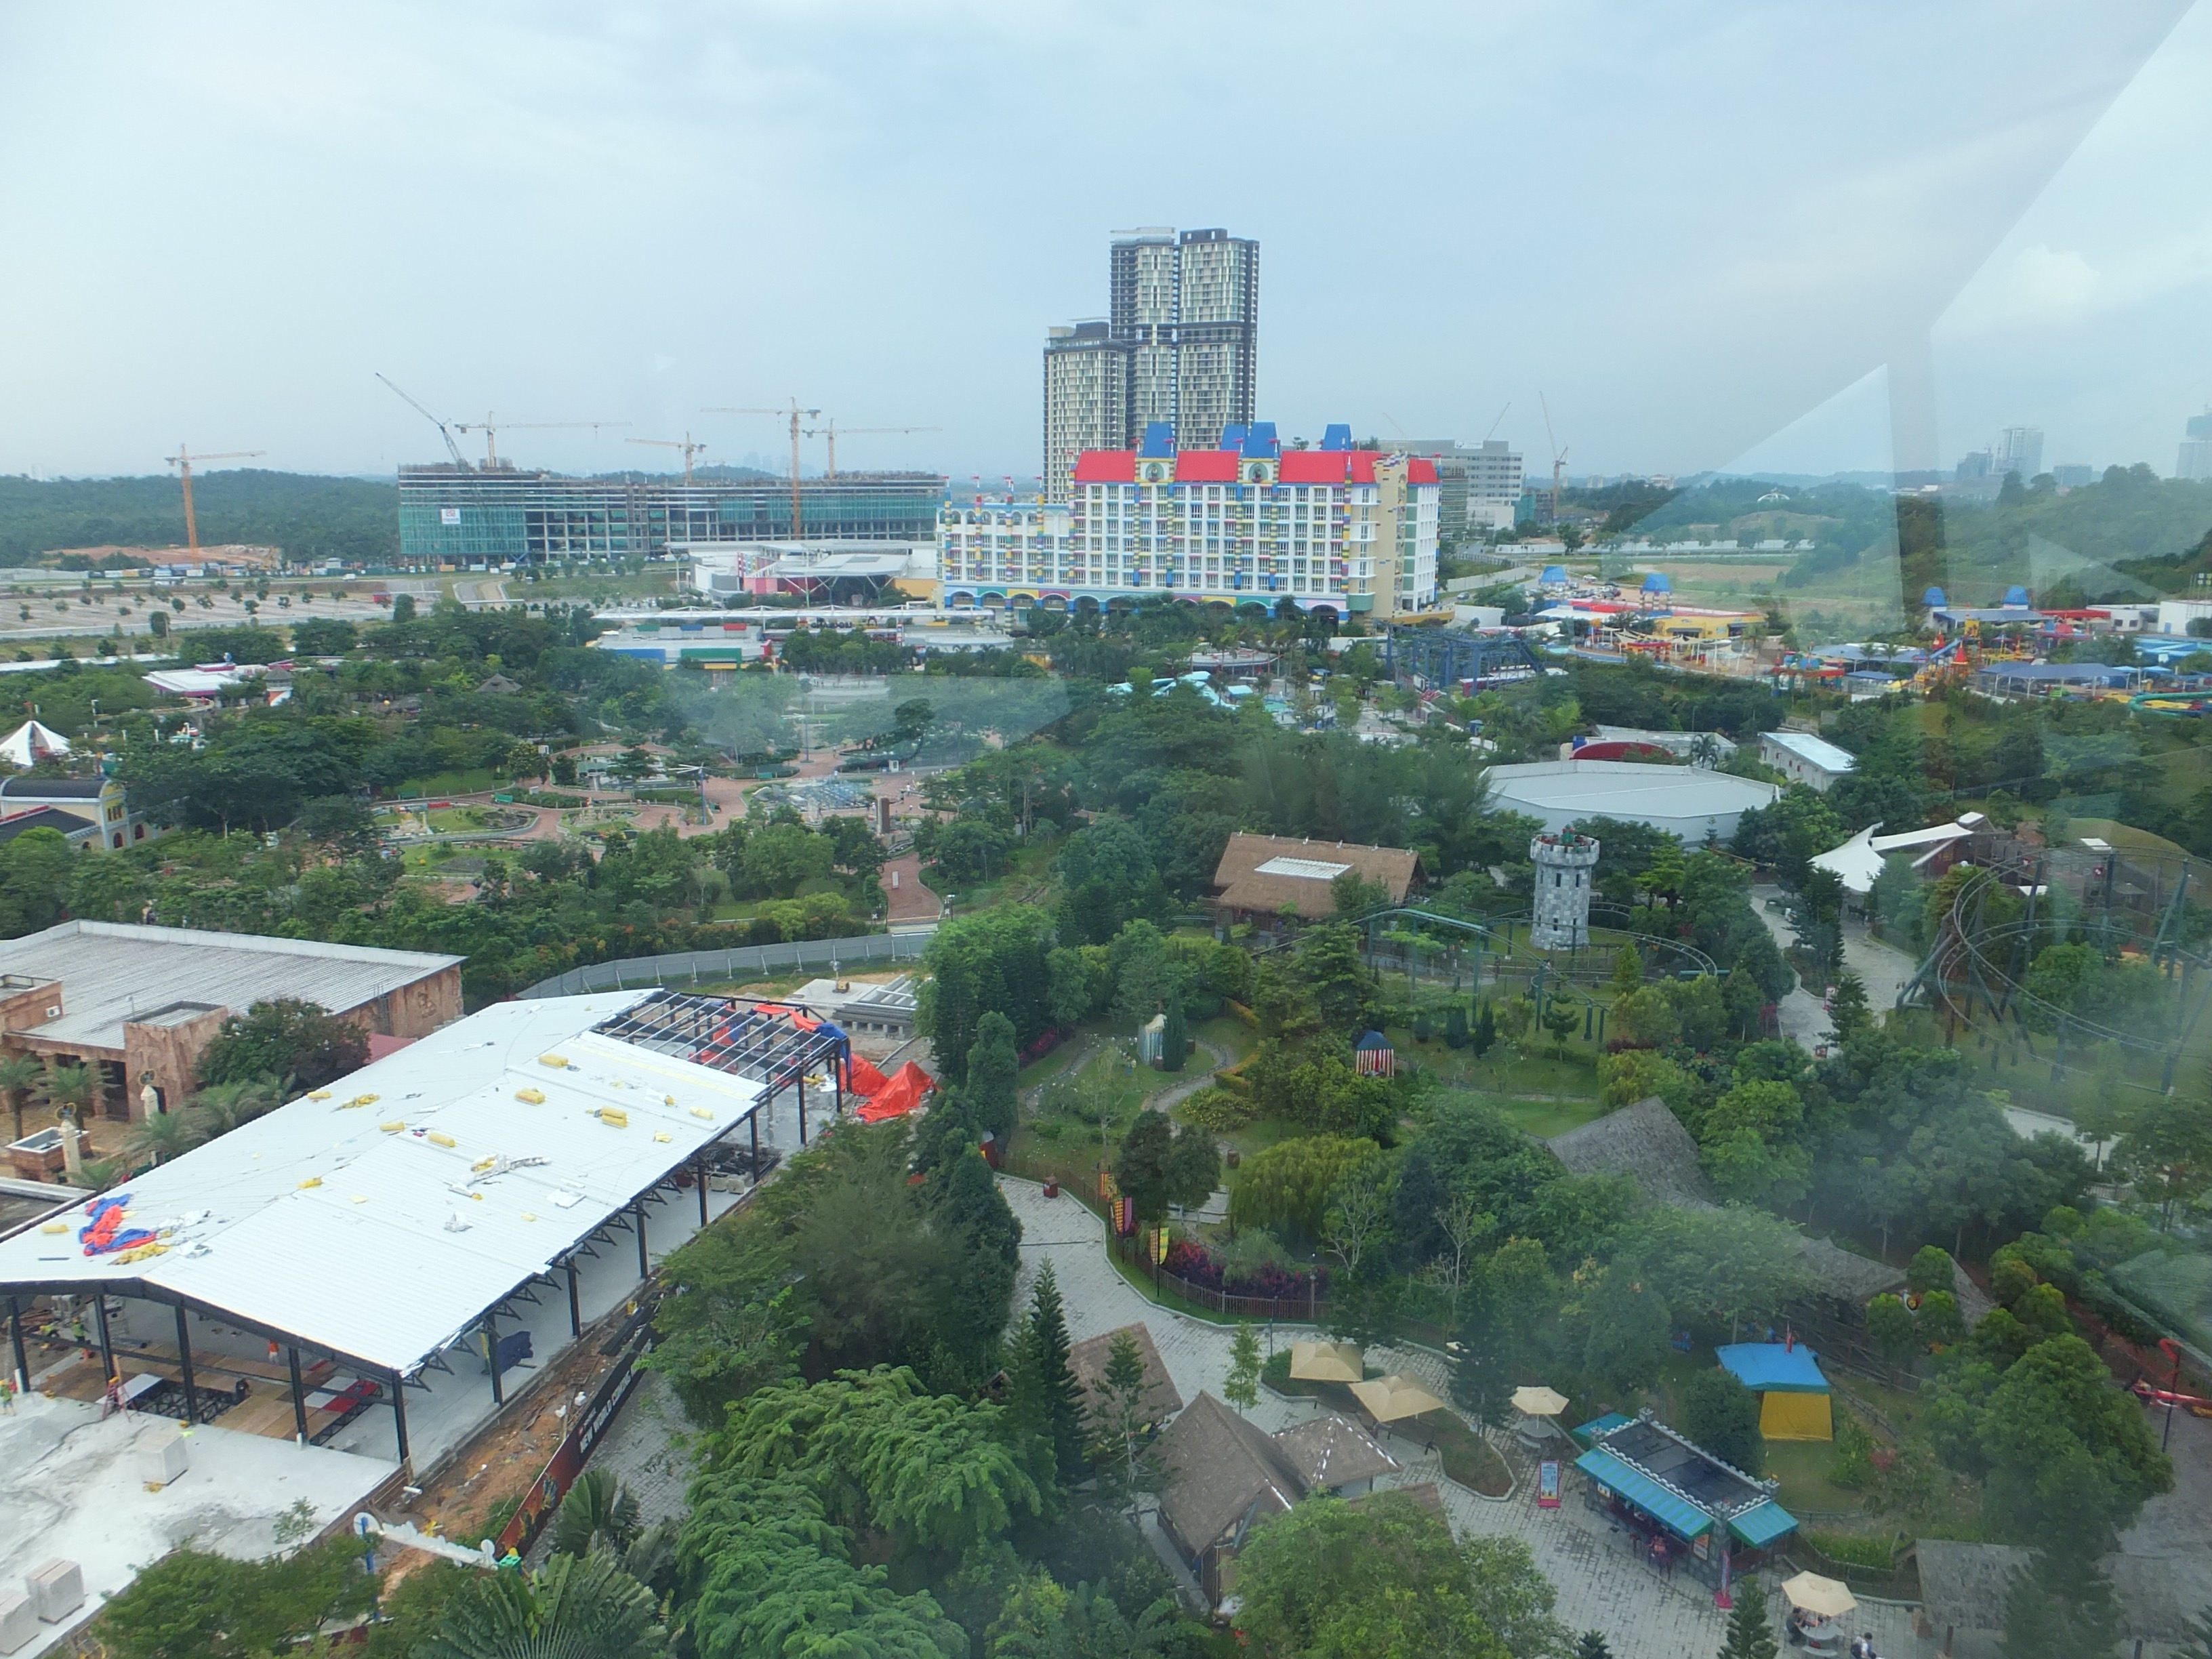 Legoland Malaysia with Kids - Family Travel Blog ...